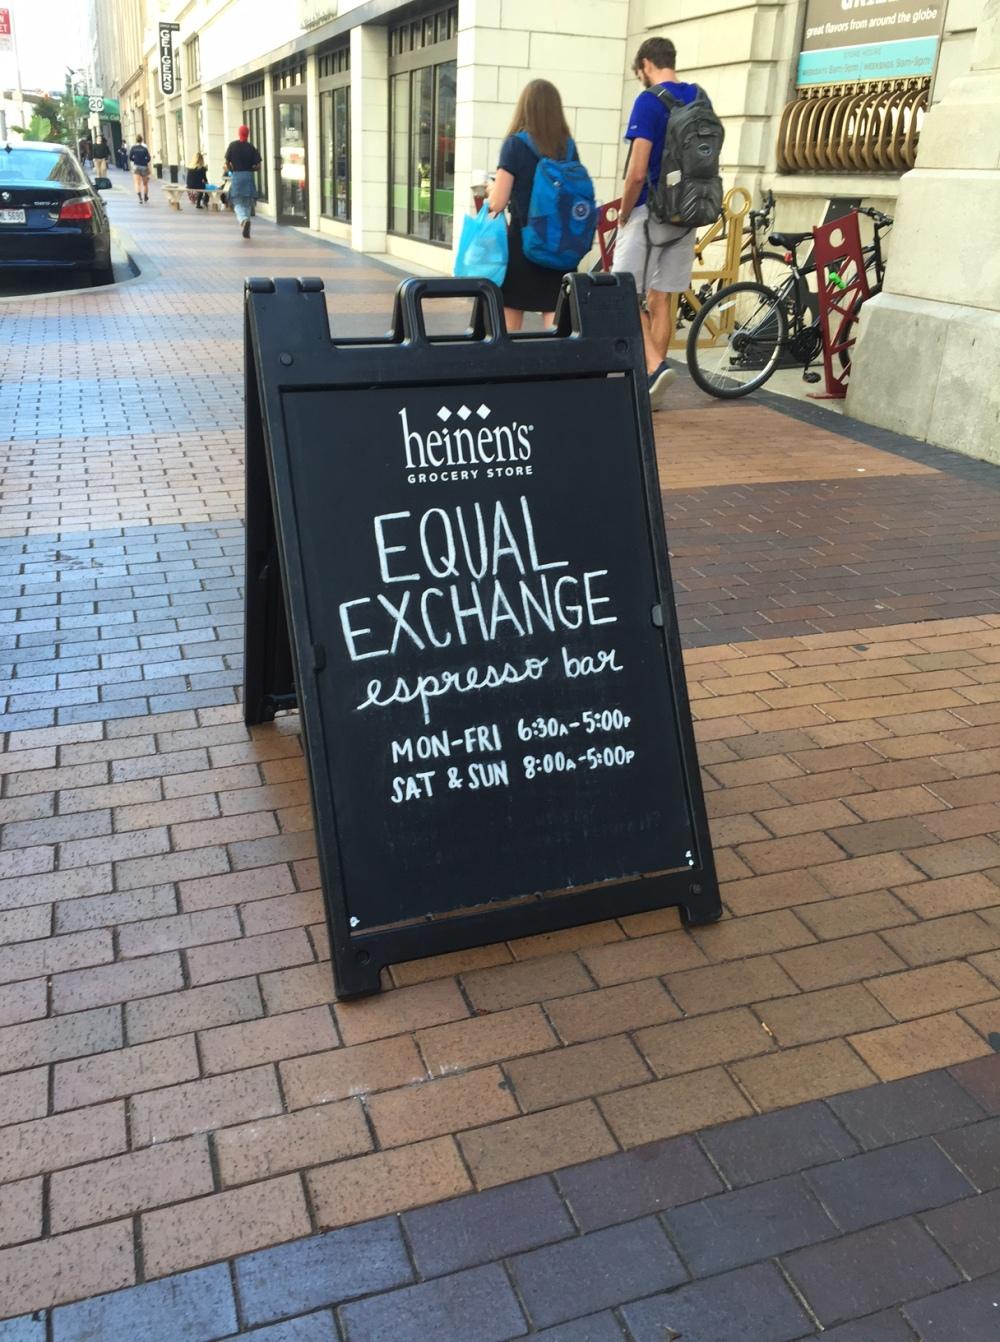 equal-exchange-espresso-bar-1